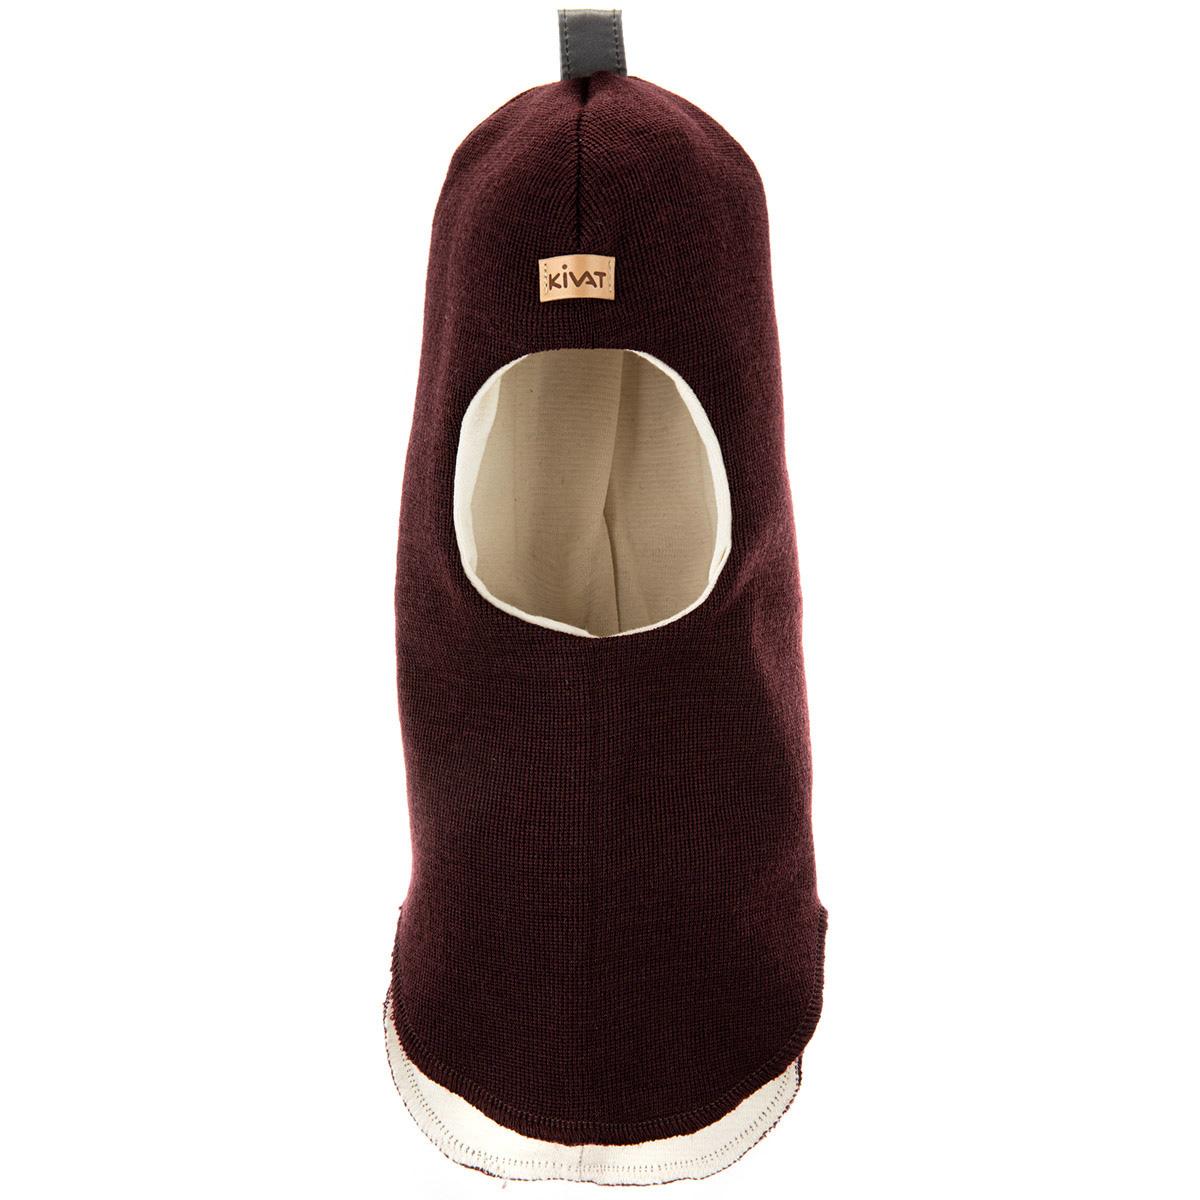 Купить Шлем Kivat, Размер 2, 495-72_2,